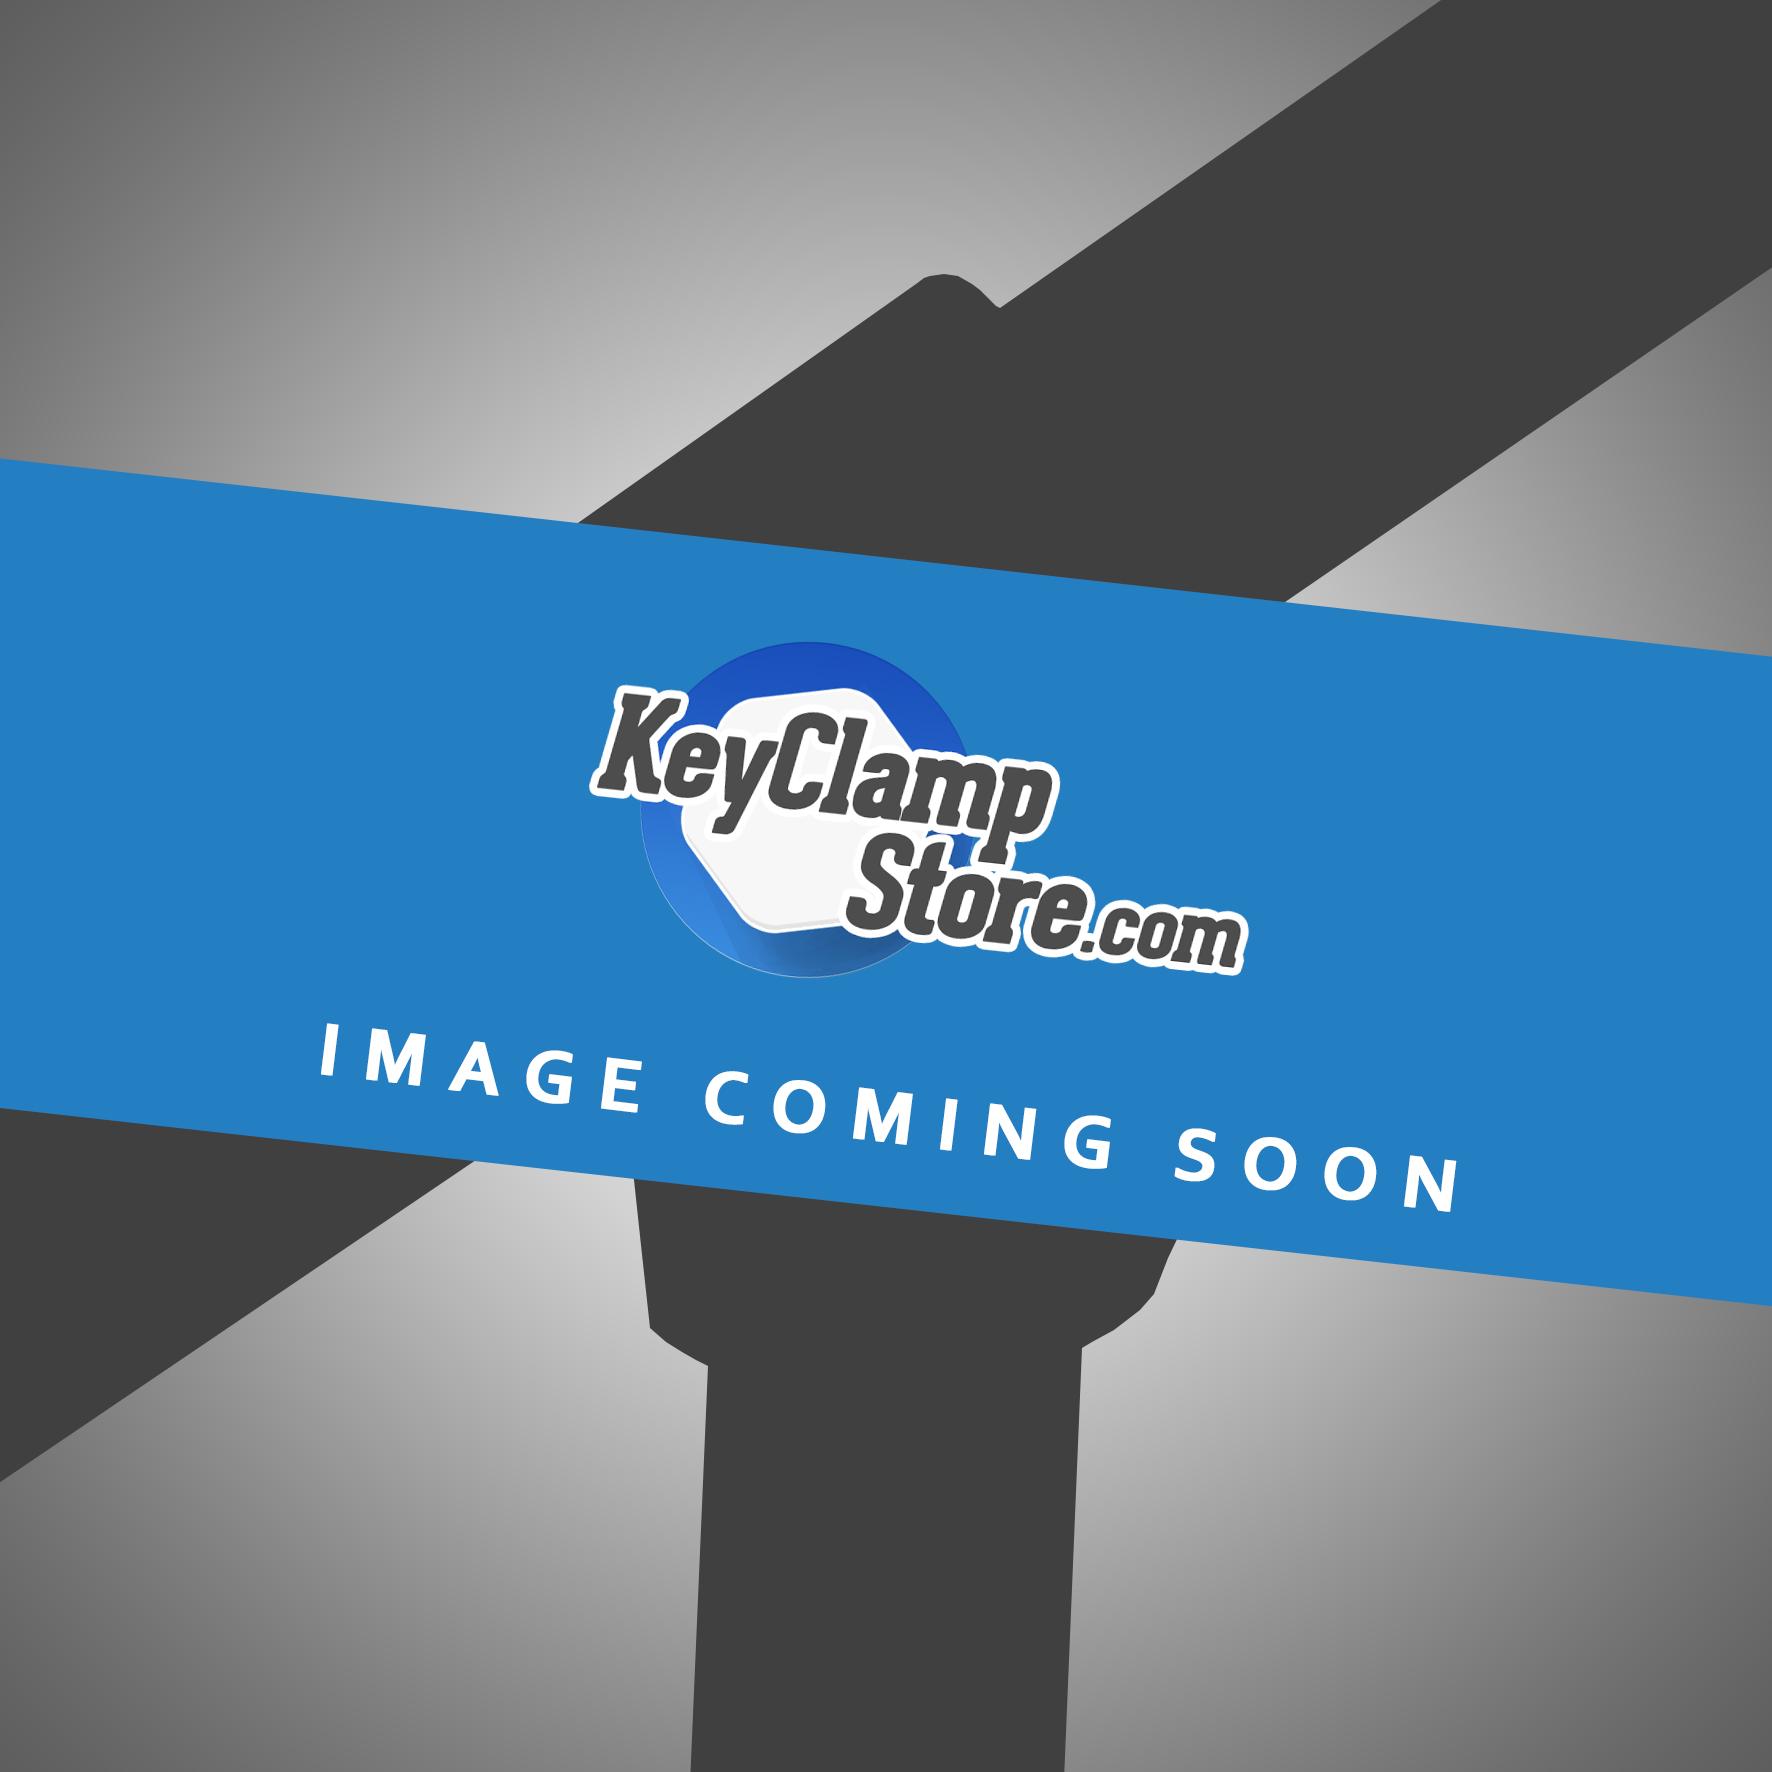 DDA 2 - End Plate for Wall Railings